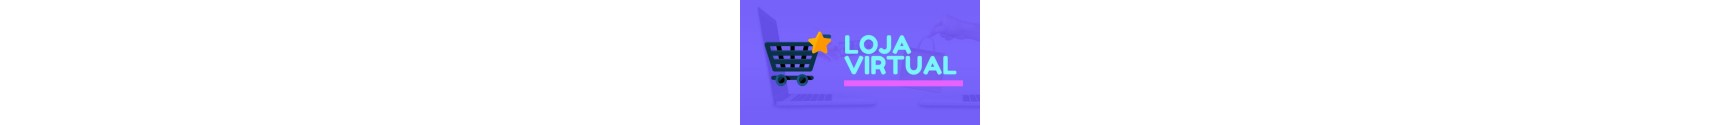 Loja Virtual Instalada